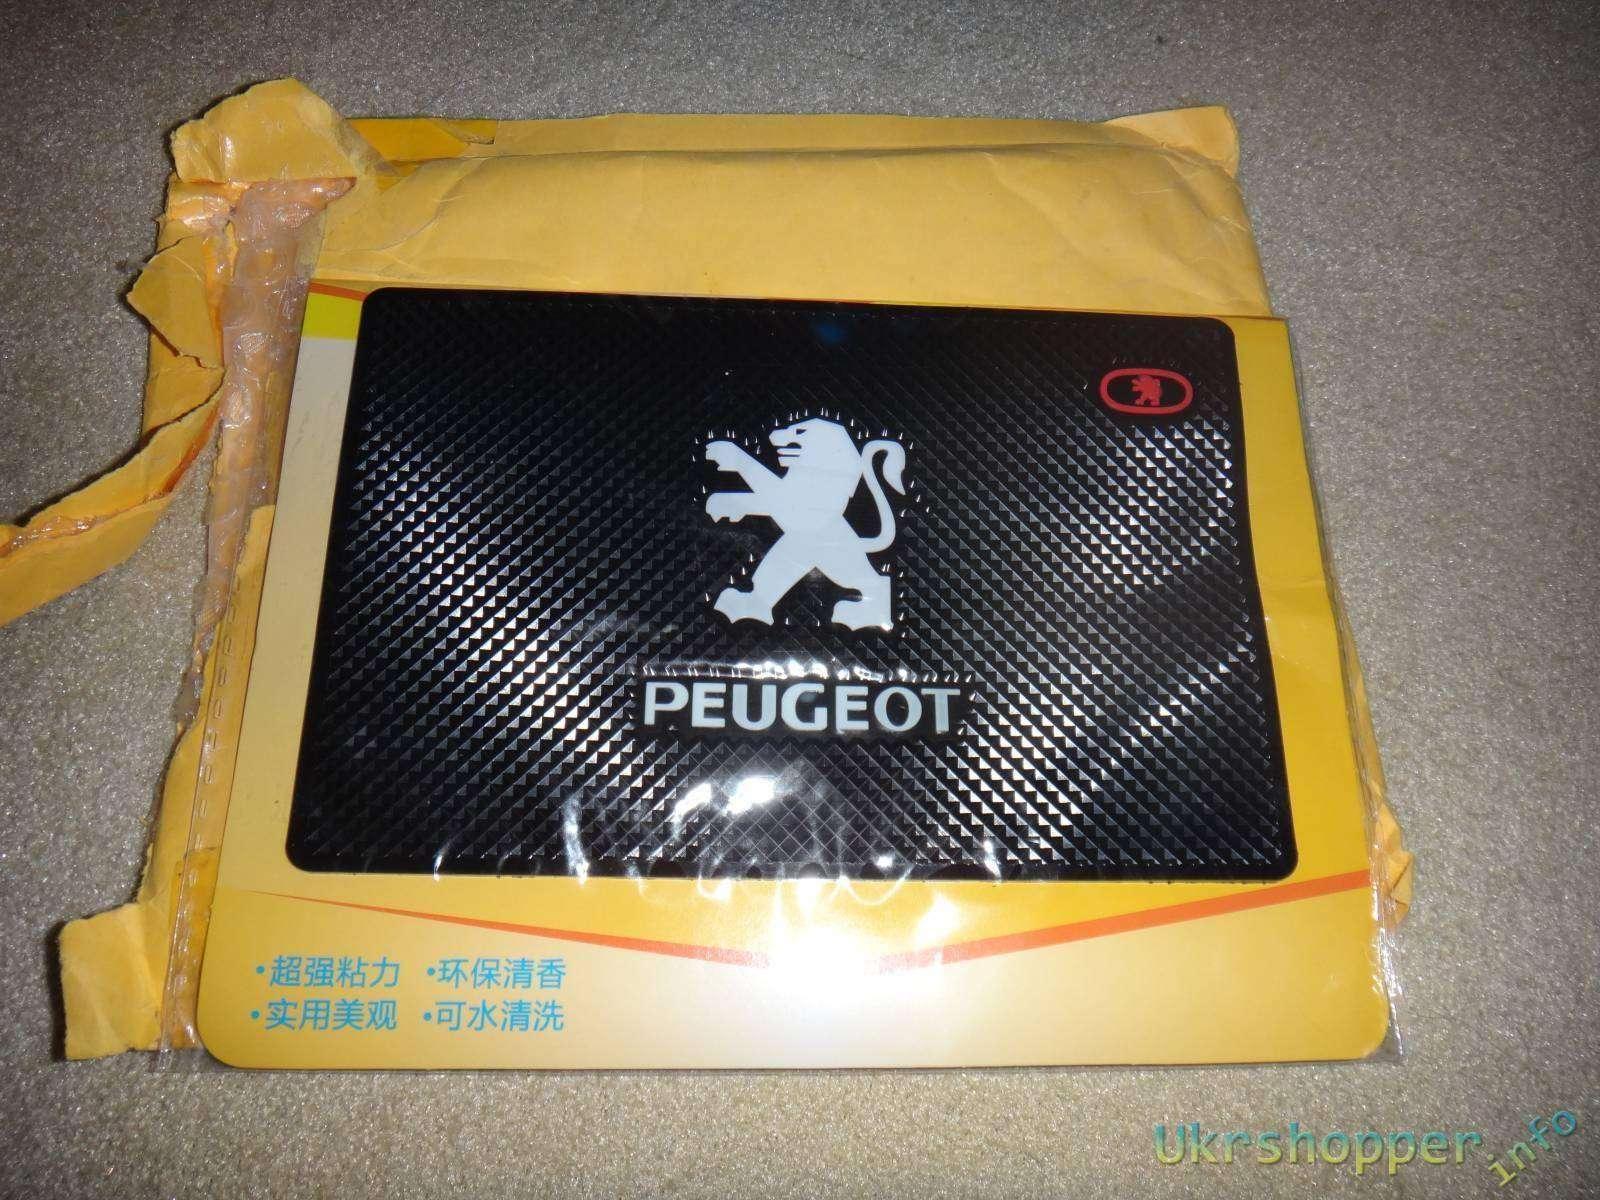 Ebay: Обзор антискользящего коврика для любителей марки Peugeot